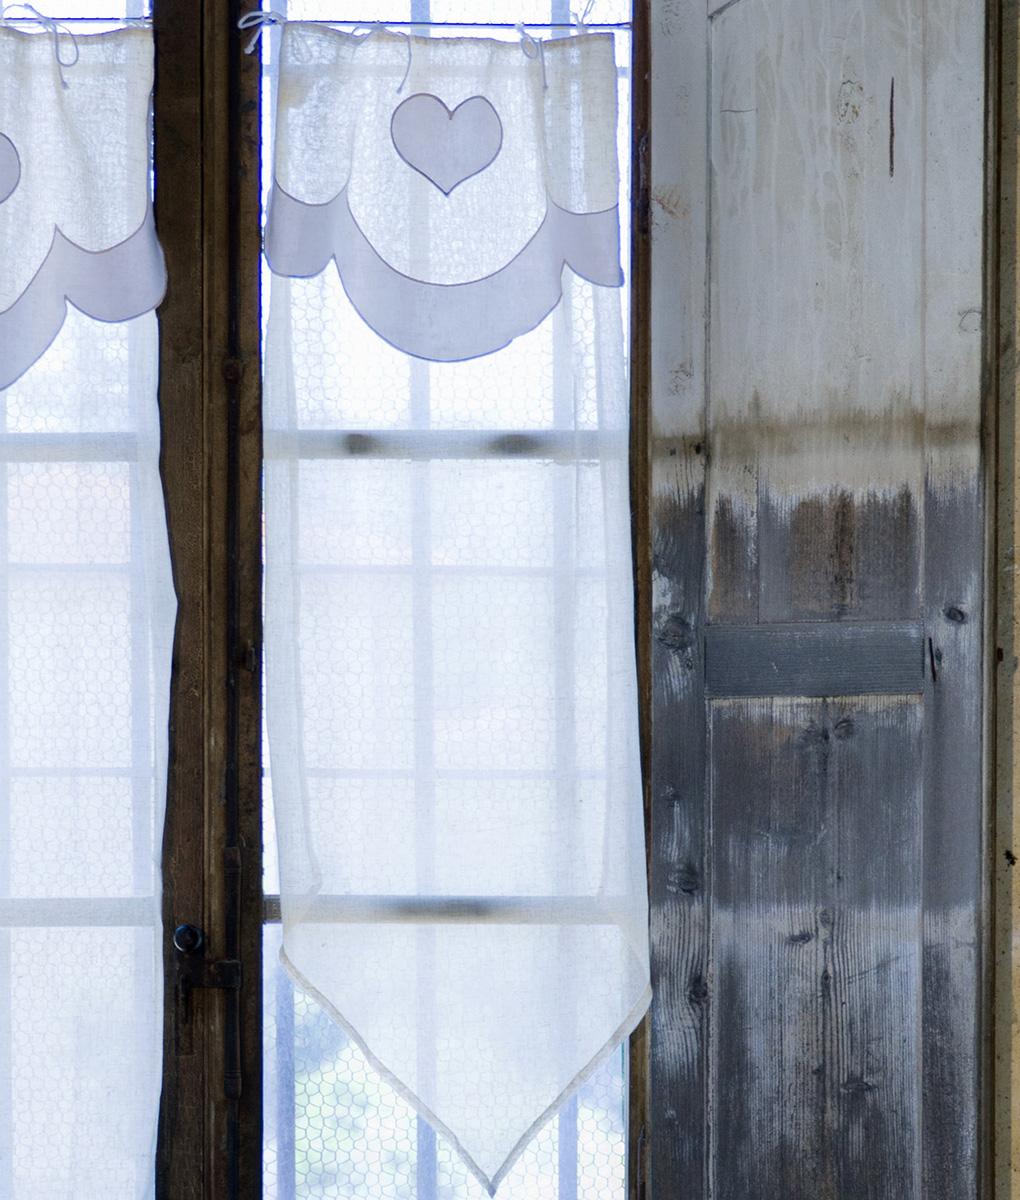 Tenda finestra con mantovana e bordo a punta 60x120 cm - Tenda bagno finestra ...